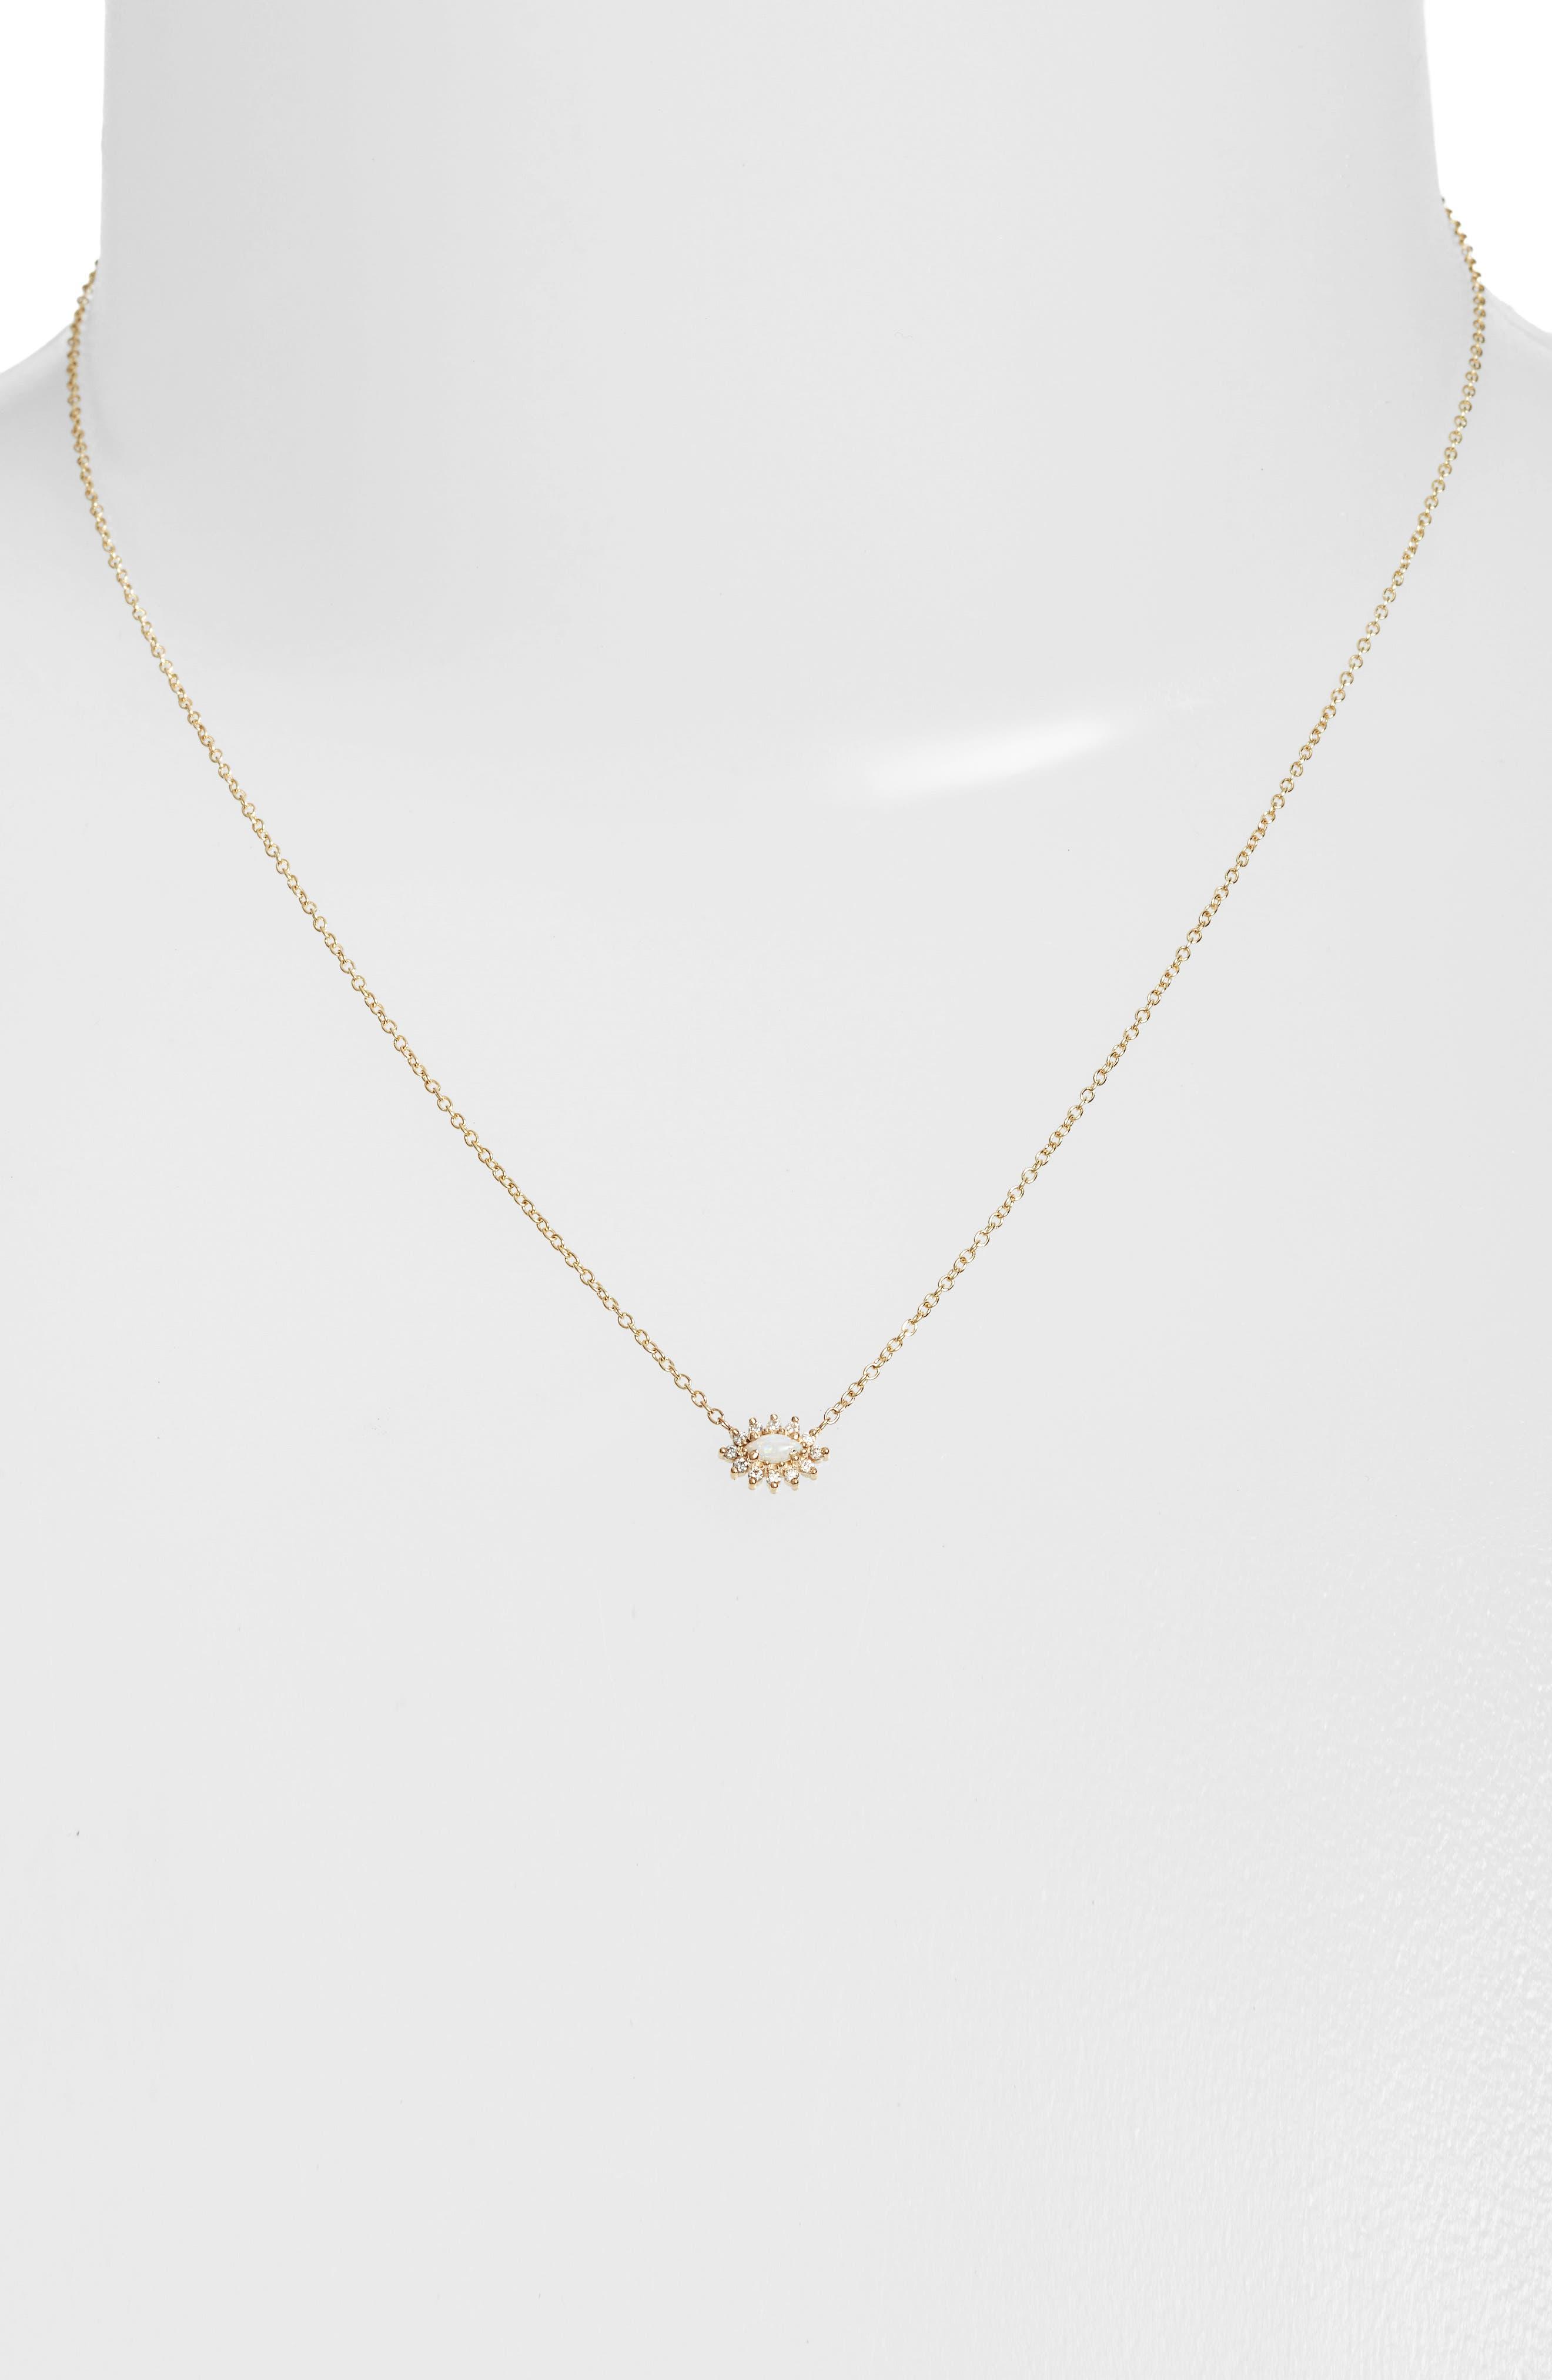 Diamond & Opal Cluster Pendant Necklace,                             Alternate thumbnail 2, color,                             Yellow Gold/ Opal